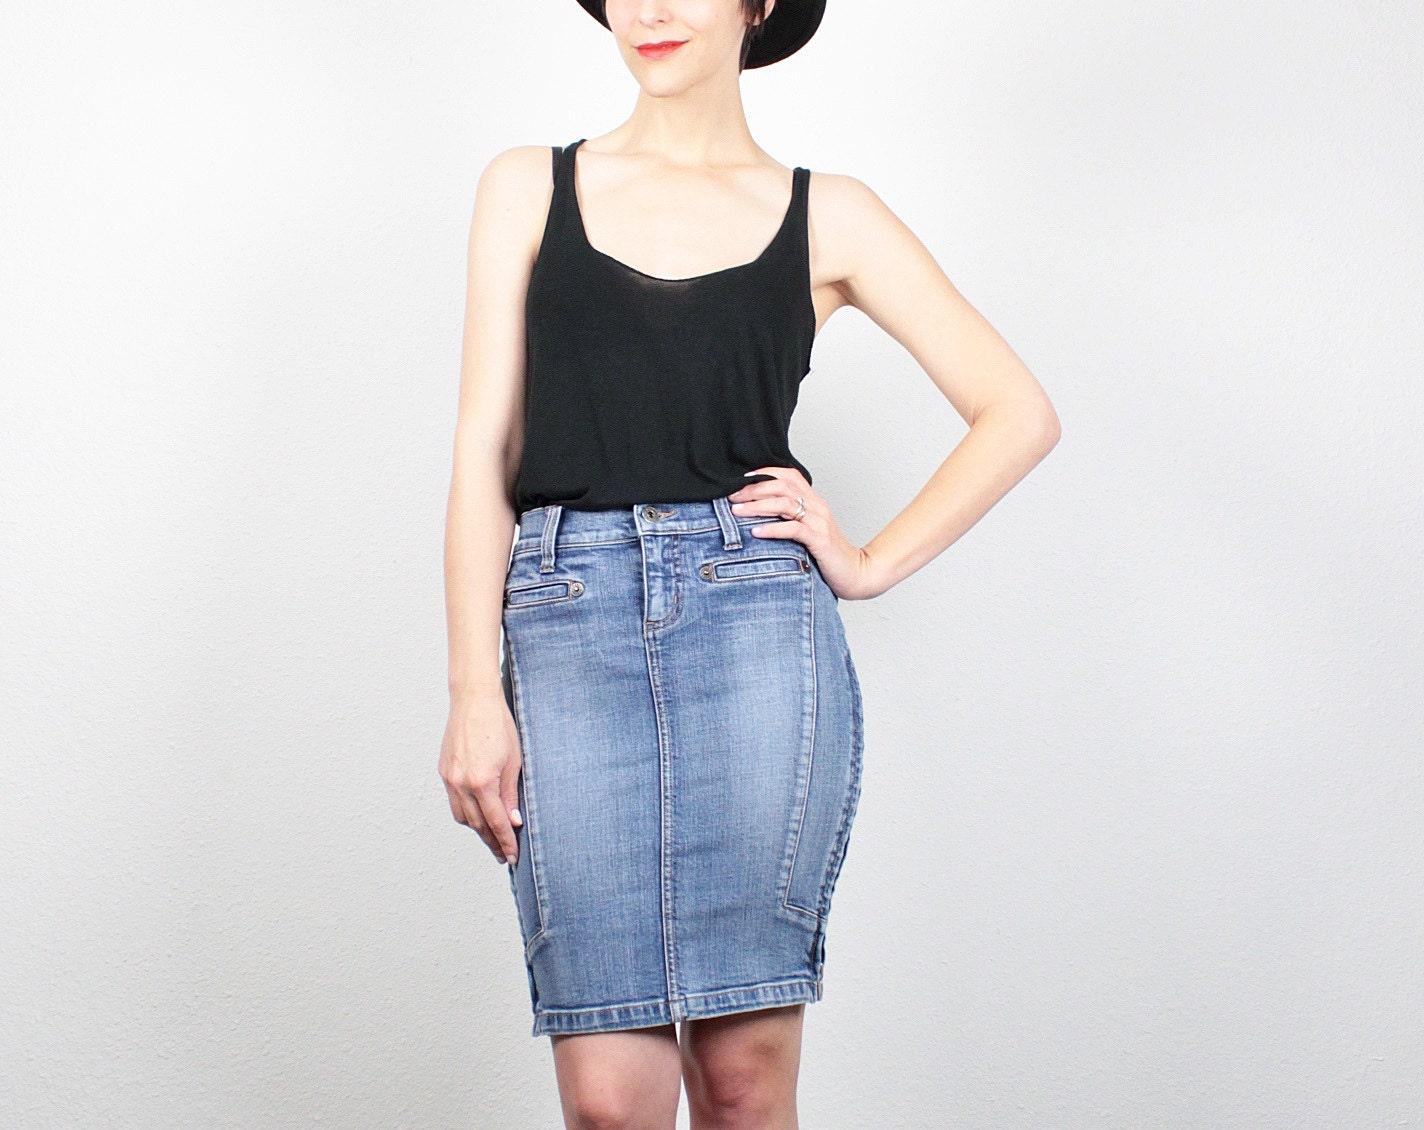 vintage 90s skirt denim skirt 1990s skirt by shoptwitchvintage